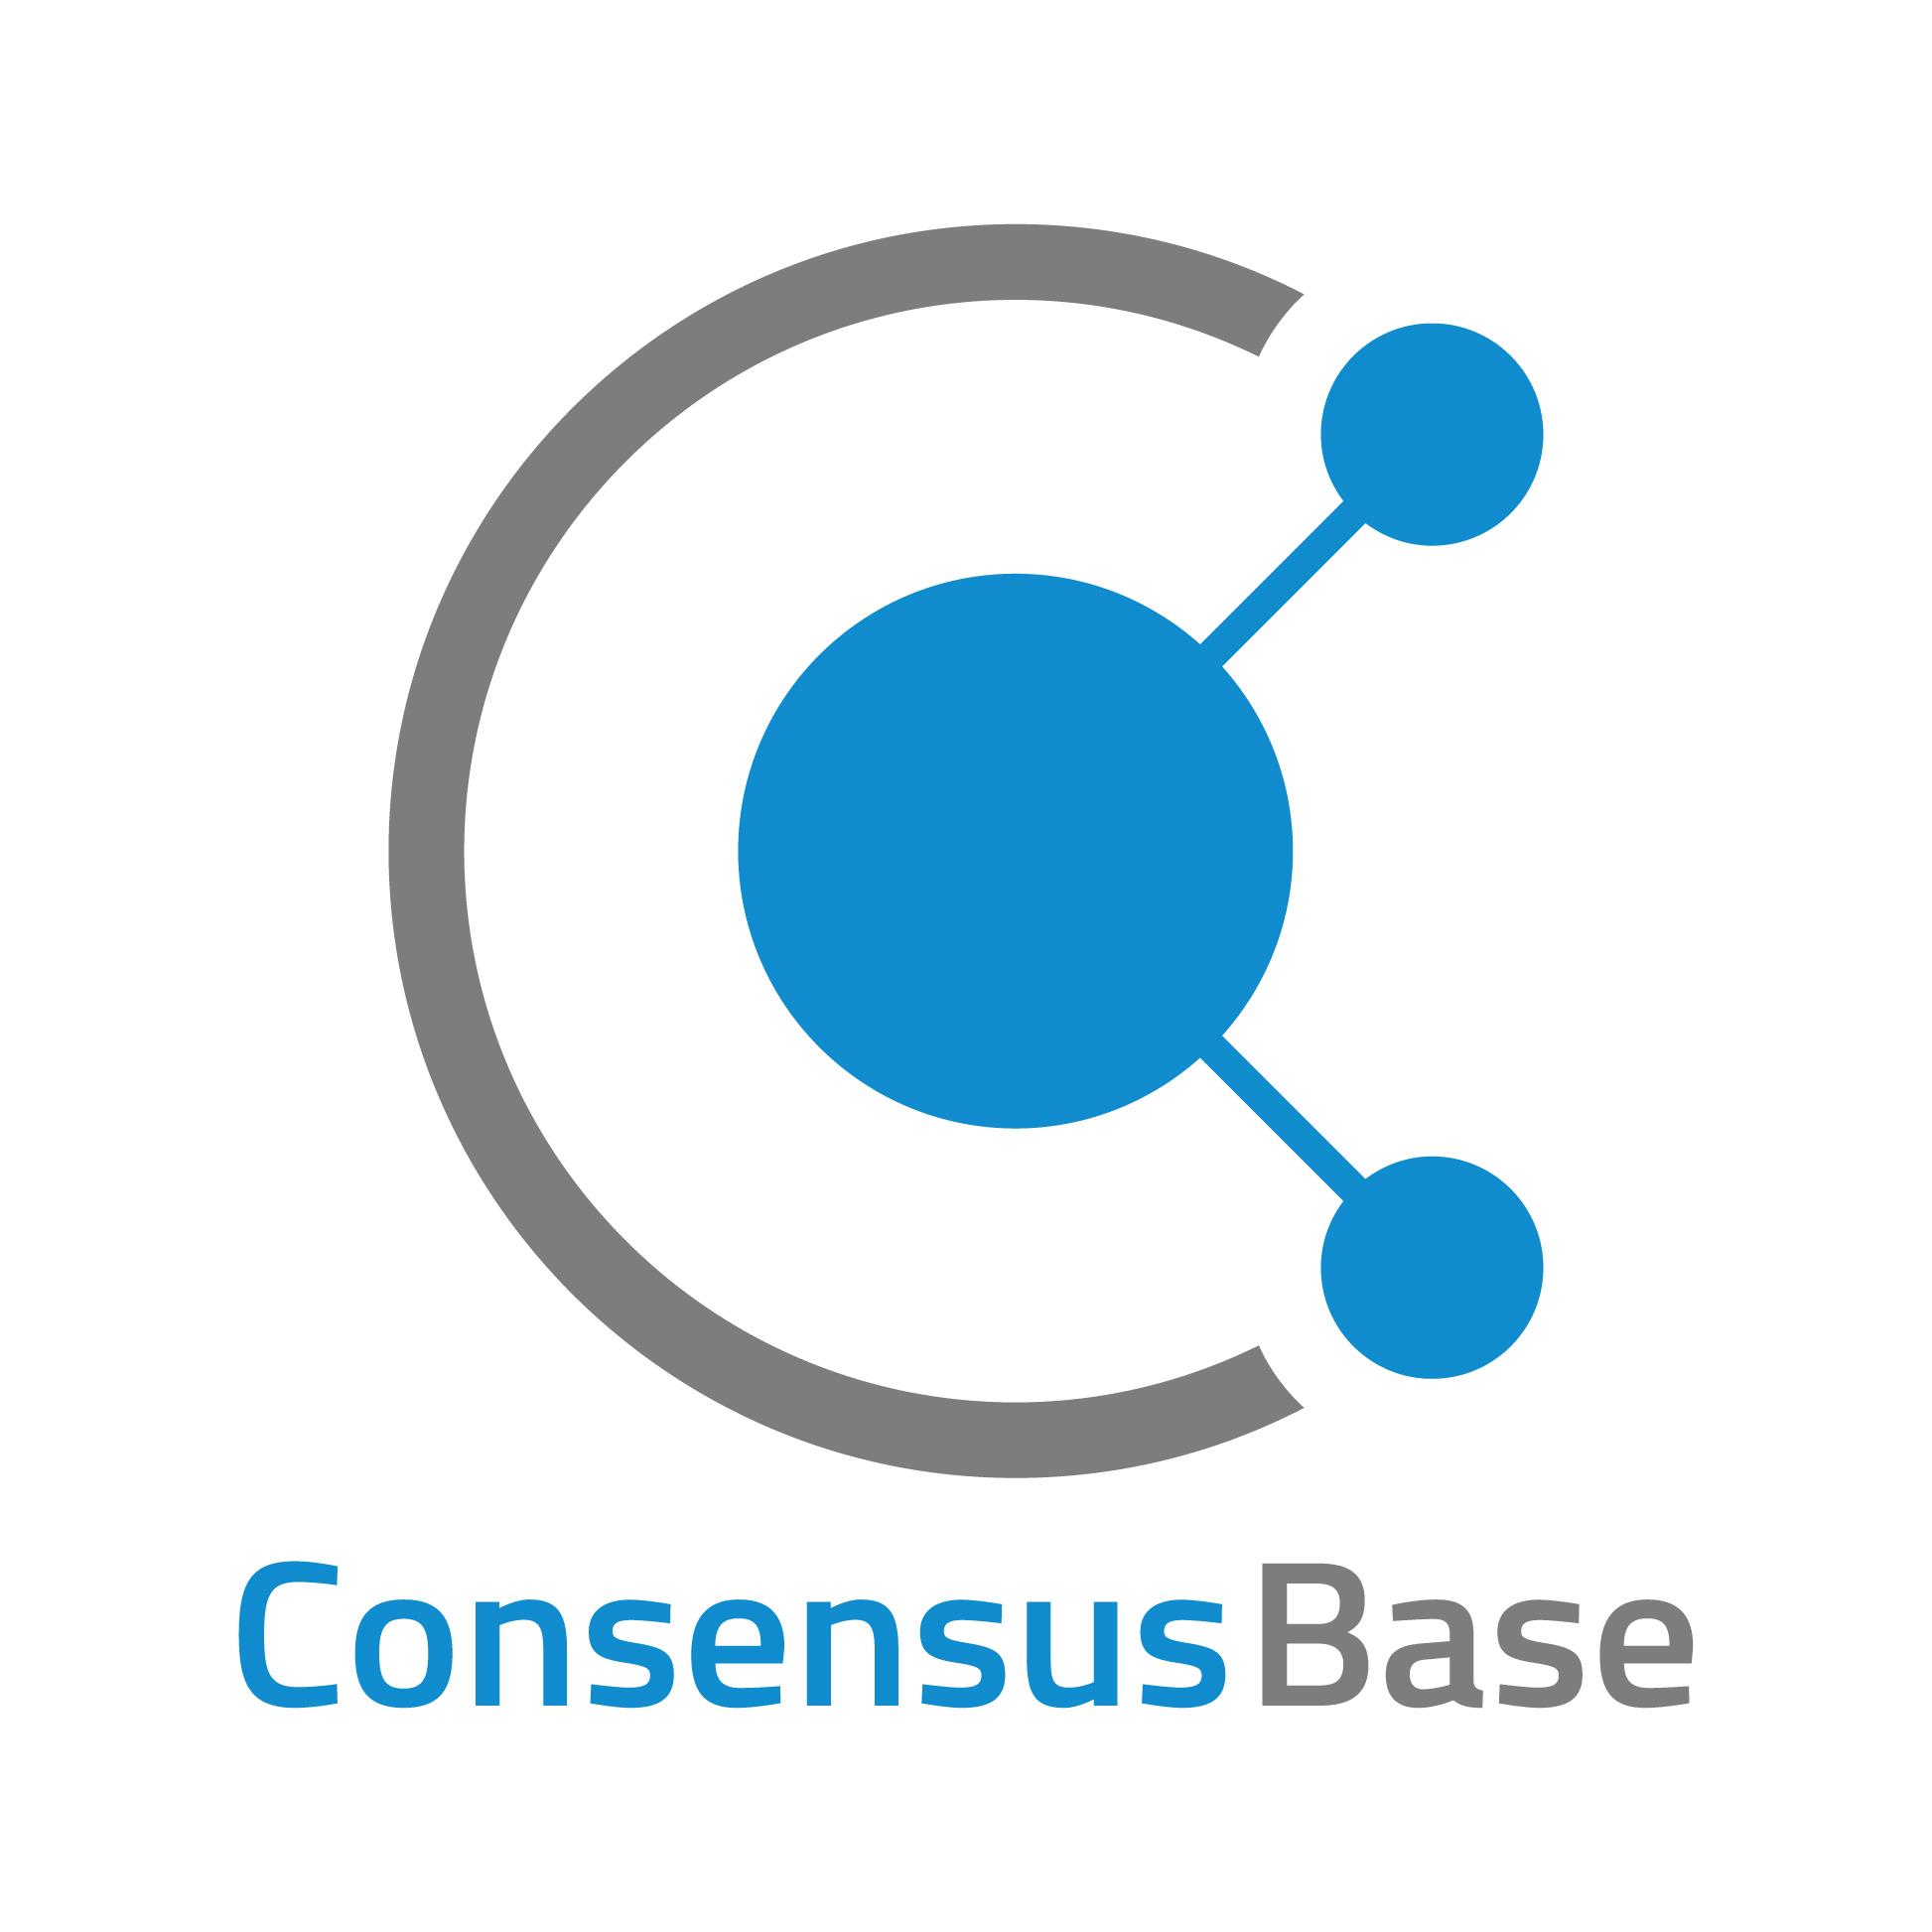 consensus-base